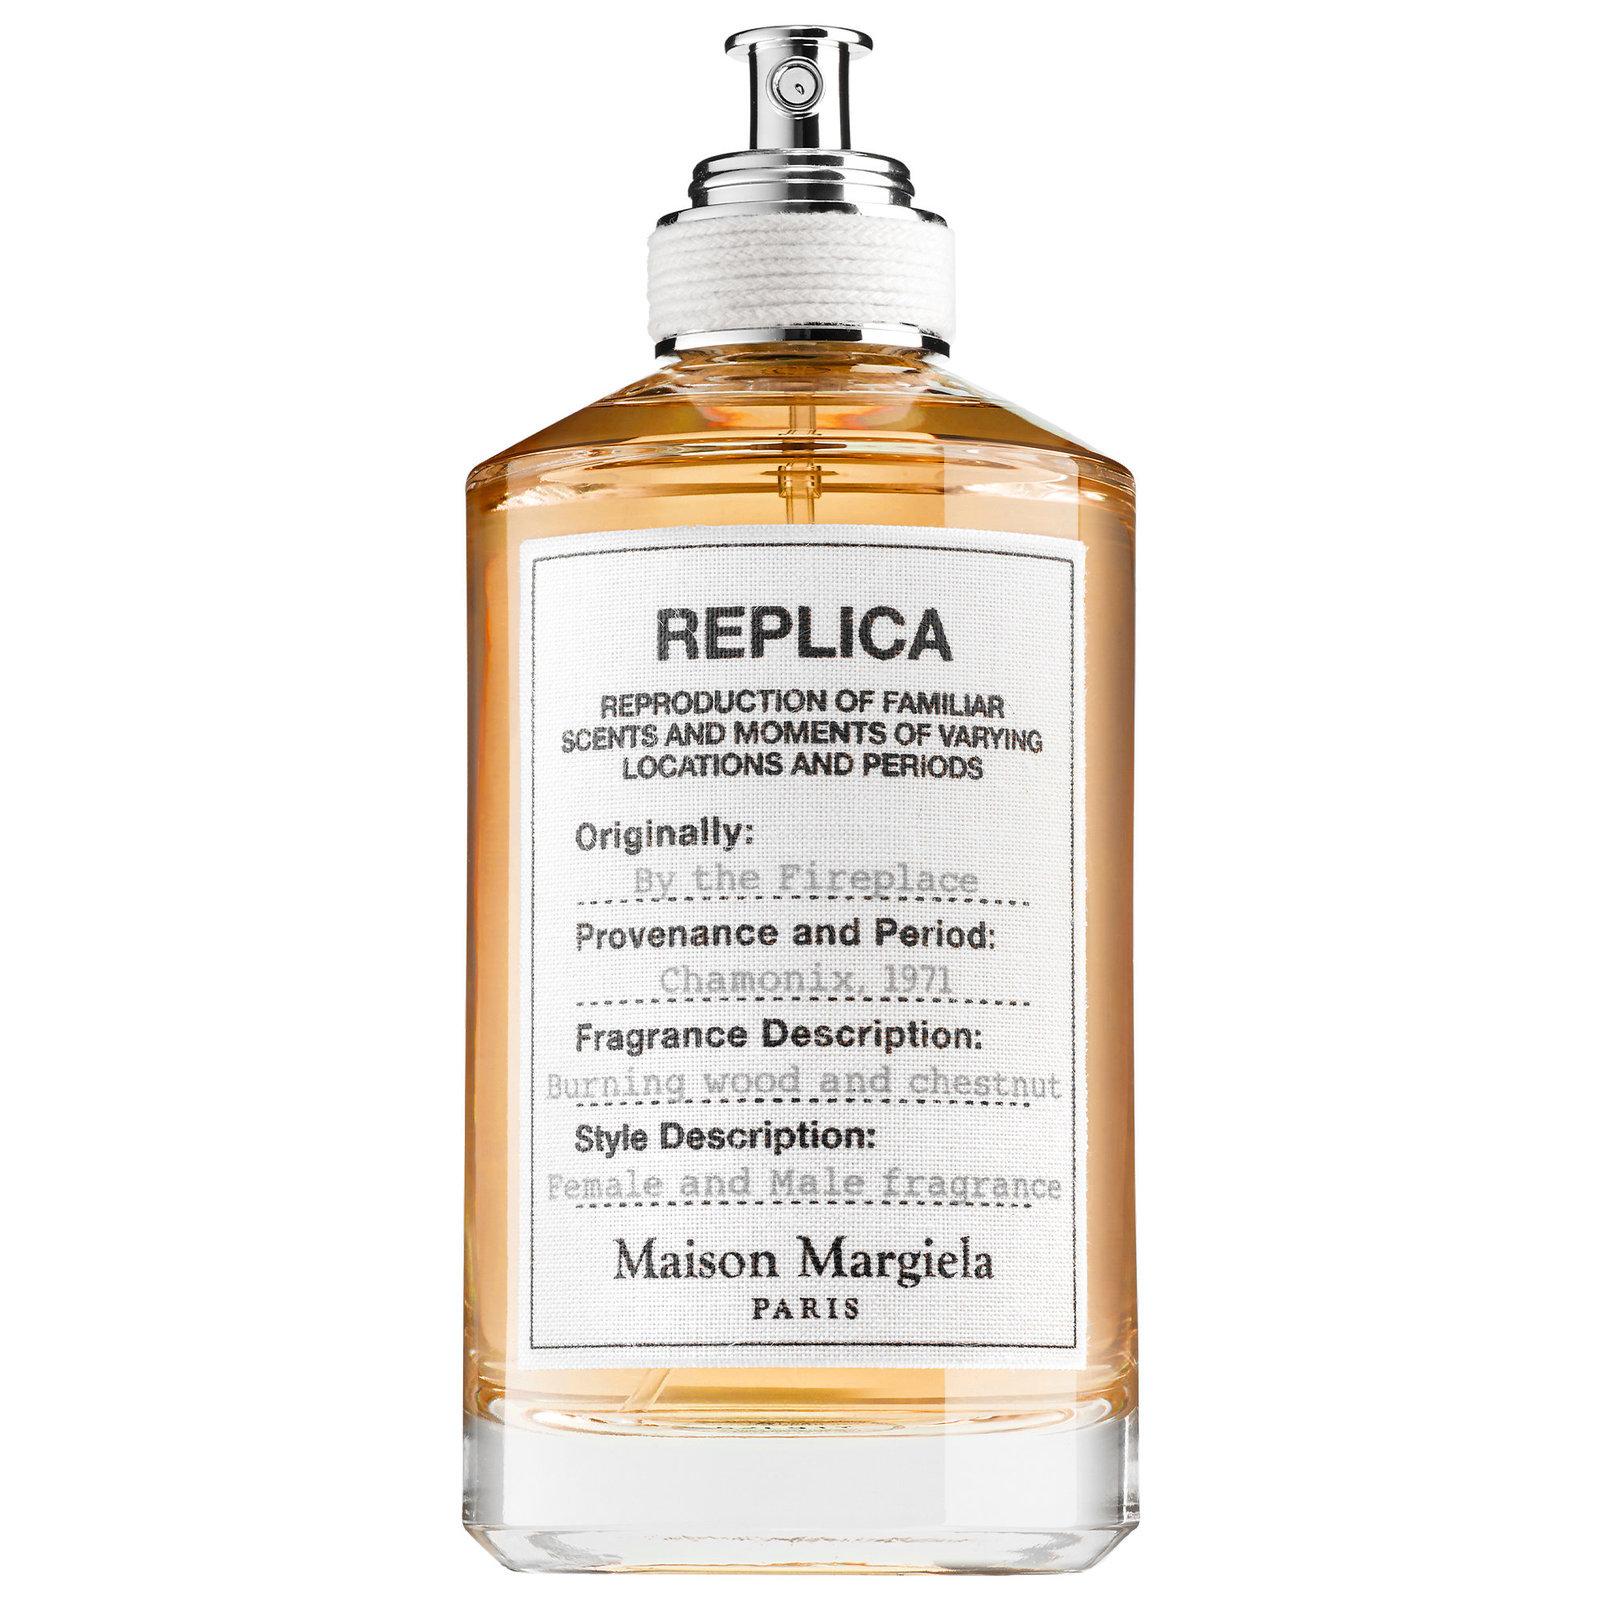 BY THE FIREPLACE by MARTIN MARGIELA 10ml Travel Spray Perfume MMM CHESTNUT